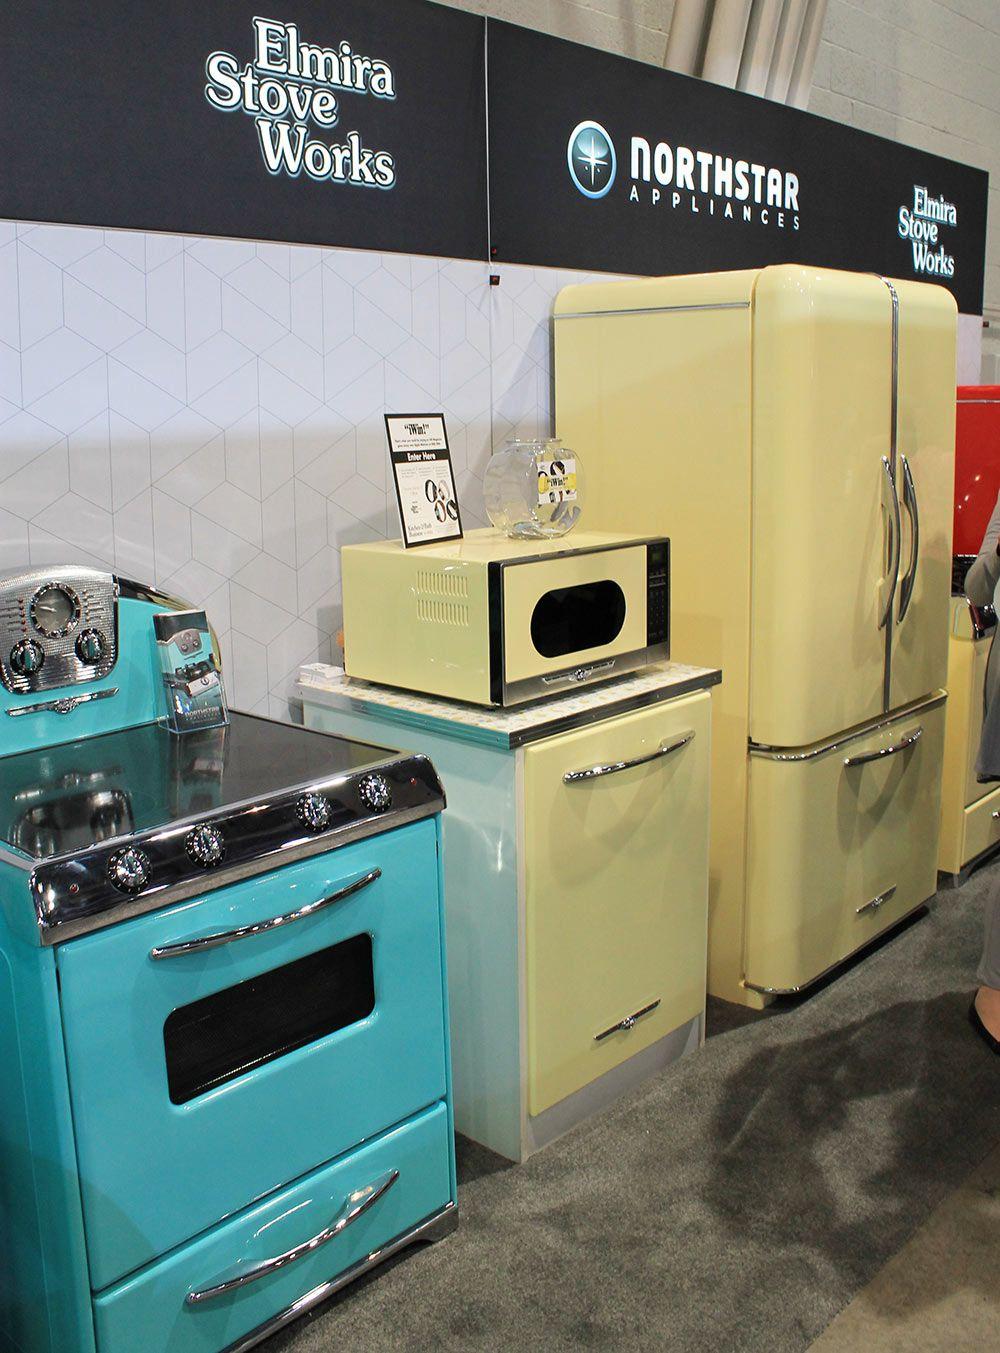 northstar vintage style kitchen appliances from elmira stove works retro appliances retro on kitchen appliances id=72163